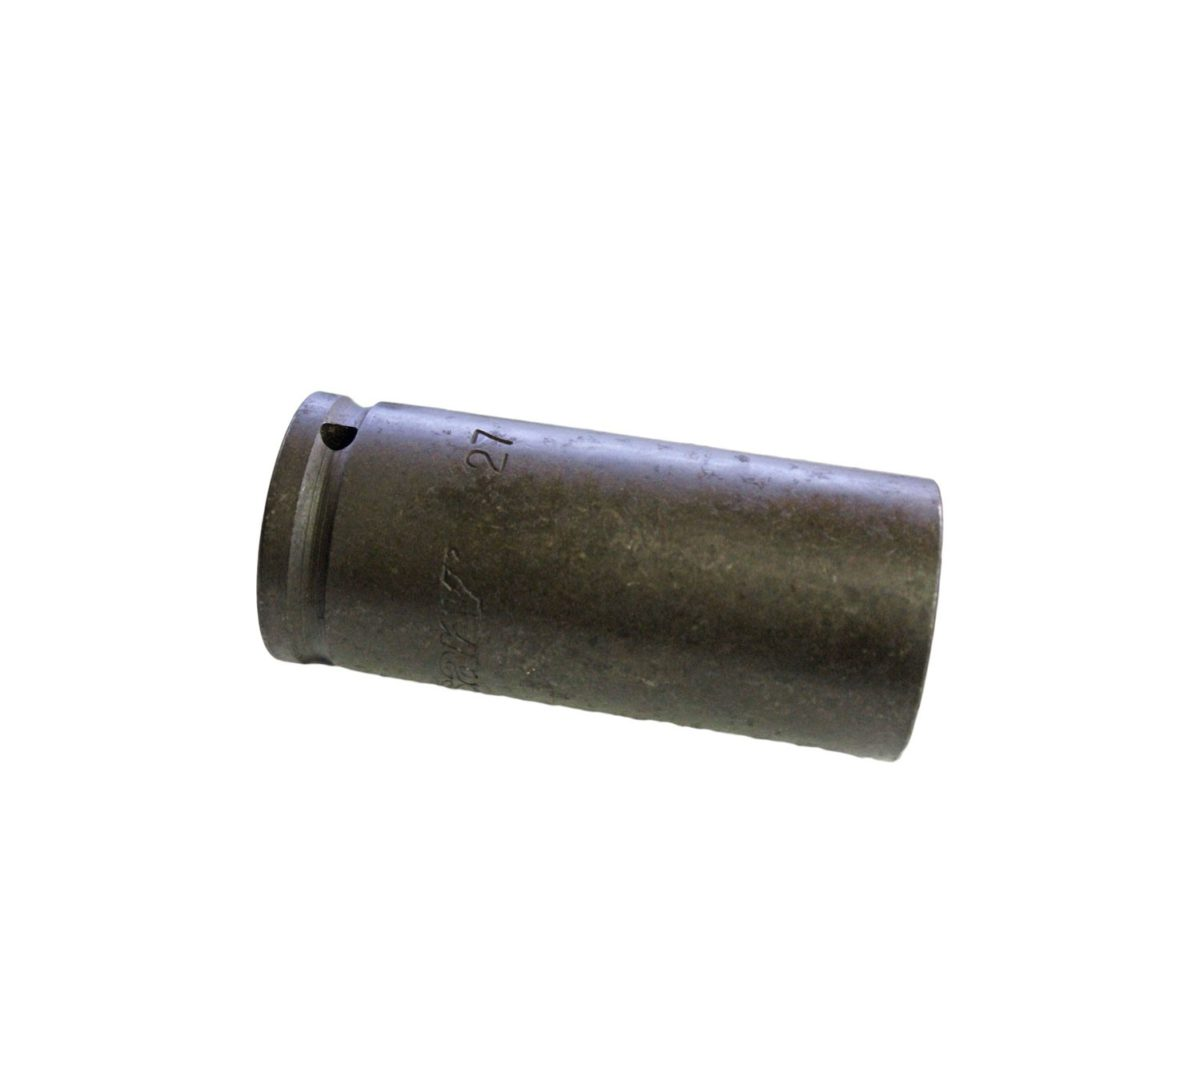 SARV Hex 27mm Deep Impact socket for Wheel Nut Extraction